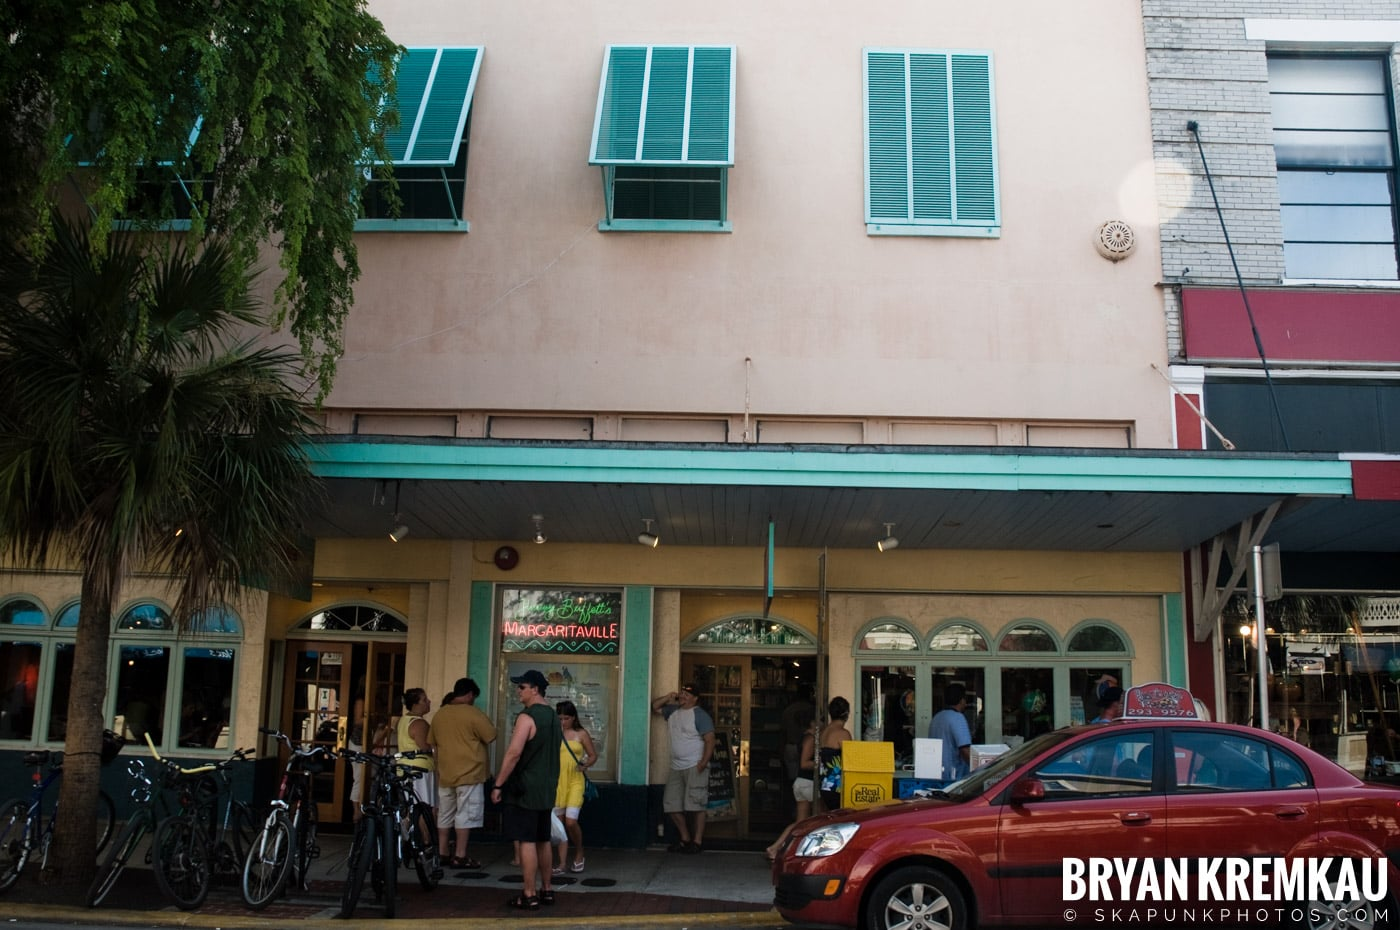 Florida Keys Vacation - 7.09.10 - 7.15.10 (45)